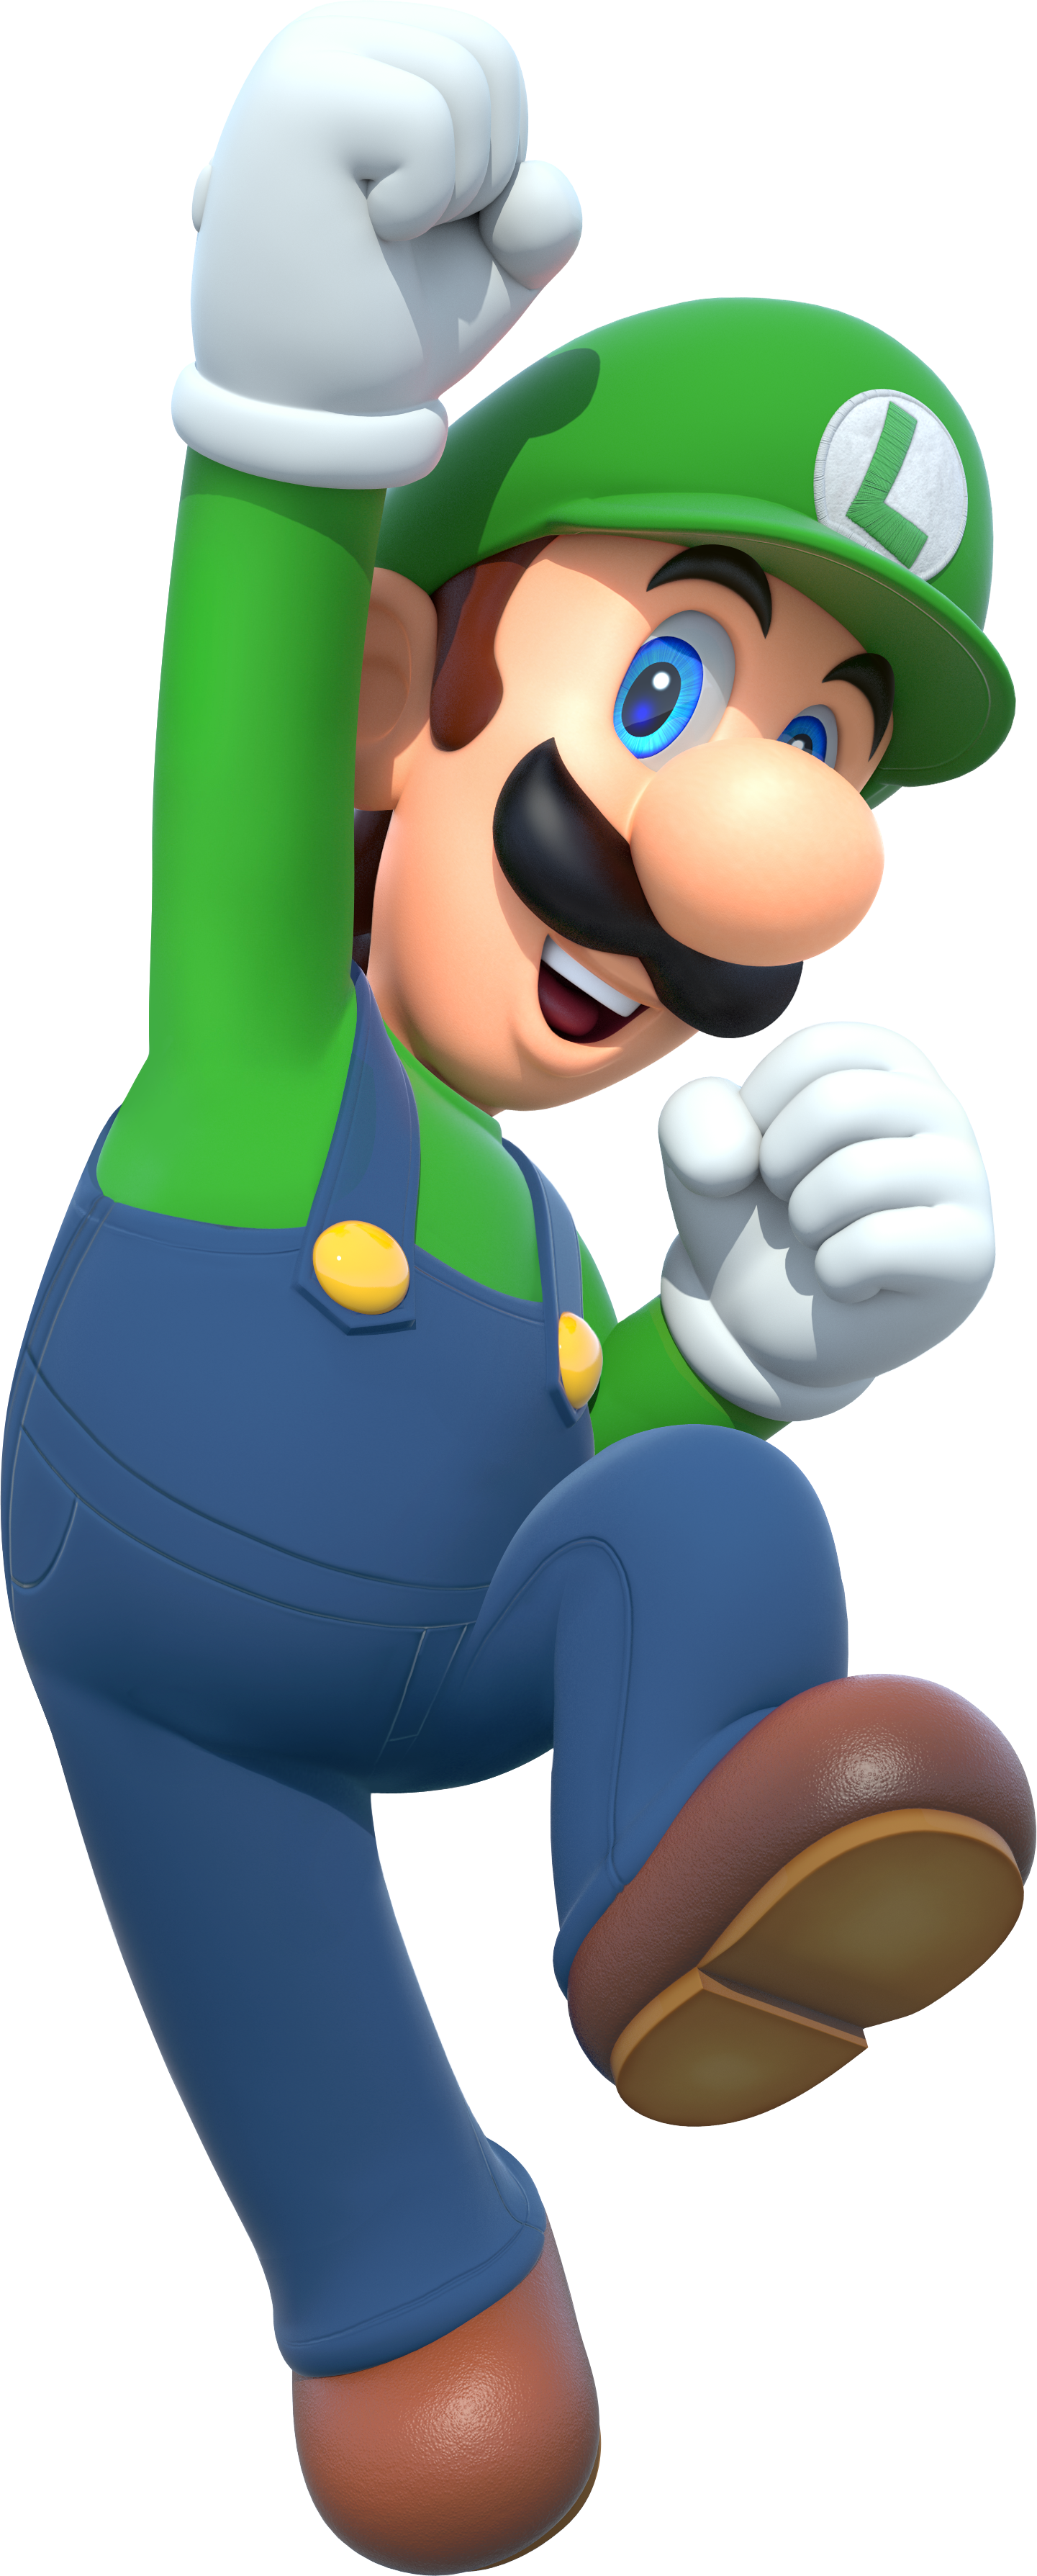 Gaming clipart nes. Luigi nintendo fandom powered